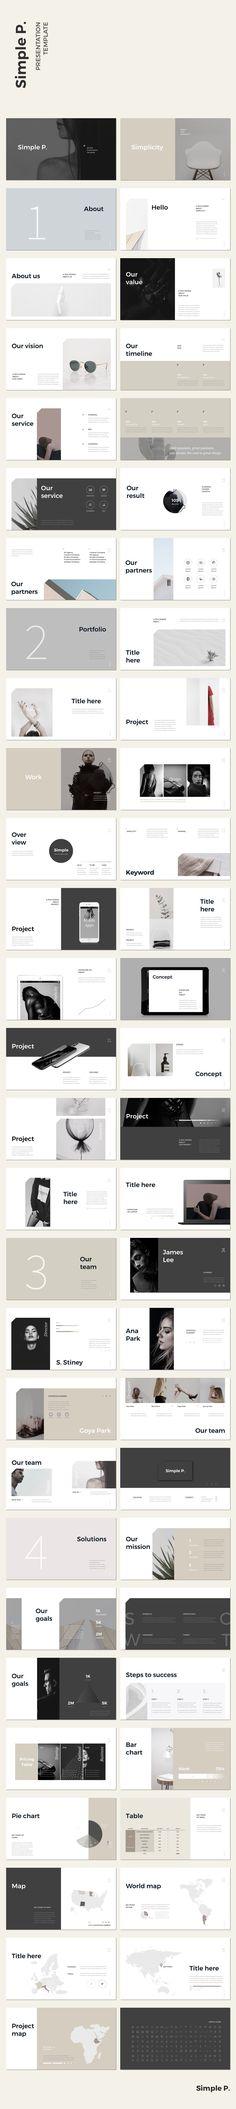 Simple P. Presentation Template #keynote #presentation #portfolio #business #marketing